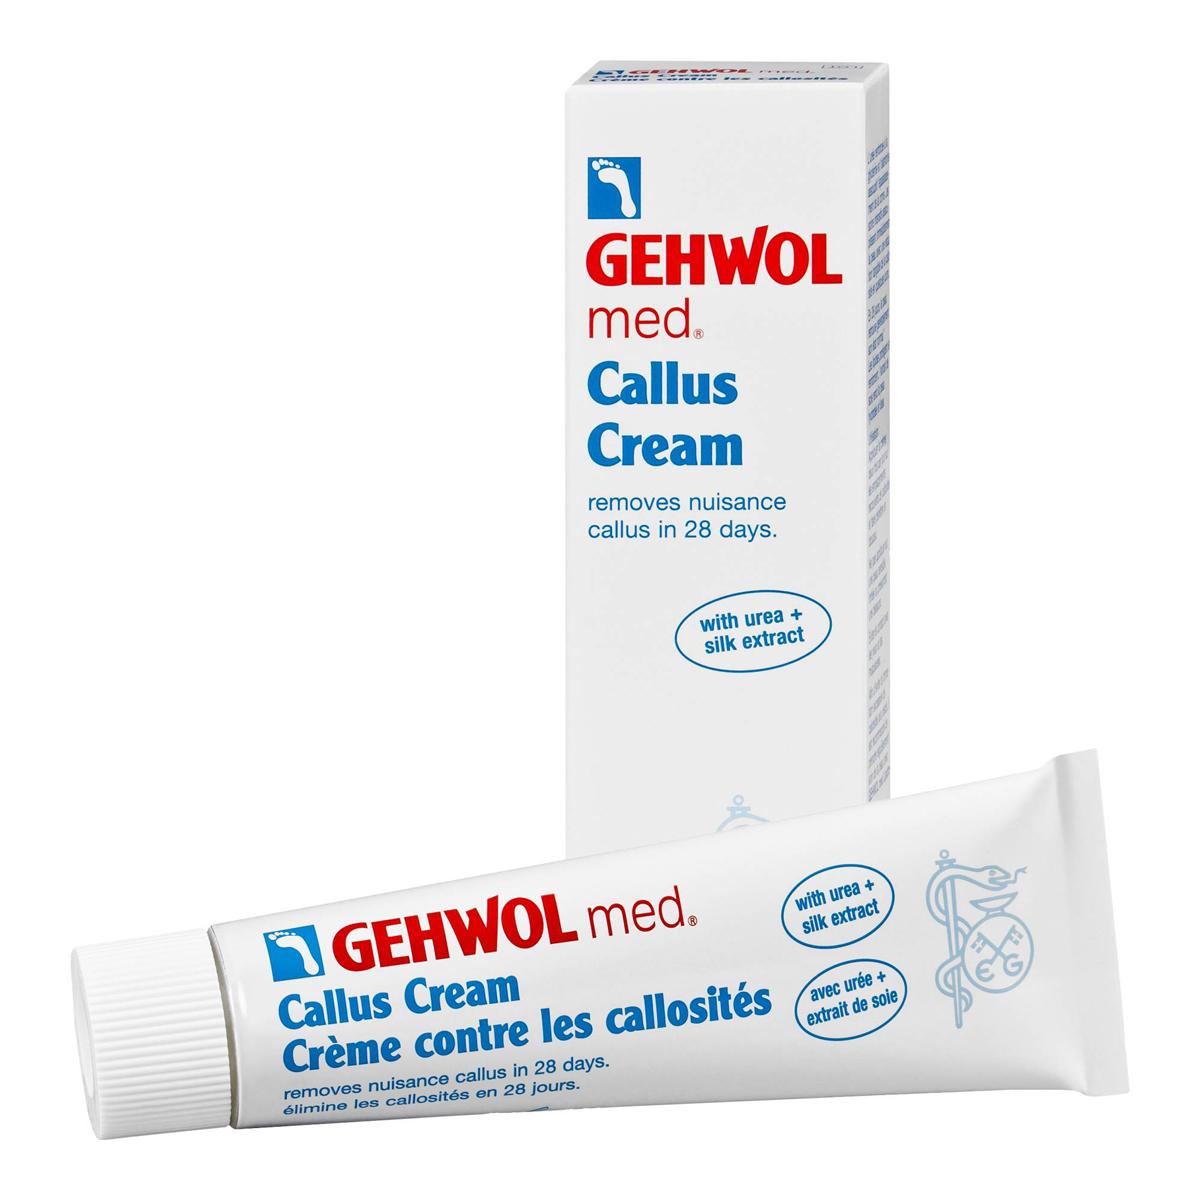 gehwol gerlachs fusskrem крем для уставших ног 75 мл Gehwol Med Callus Cream - Крем для загрубевшей кожи, 75 мл